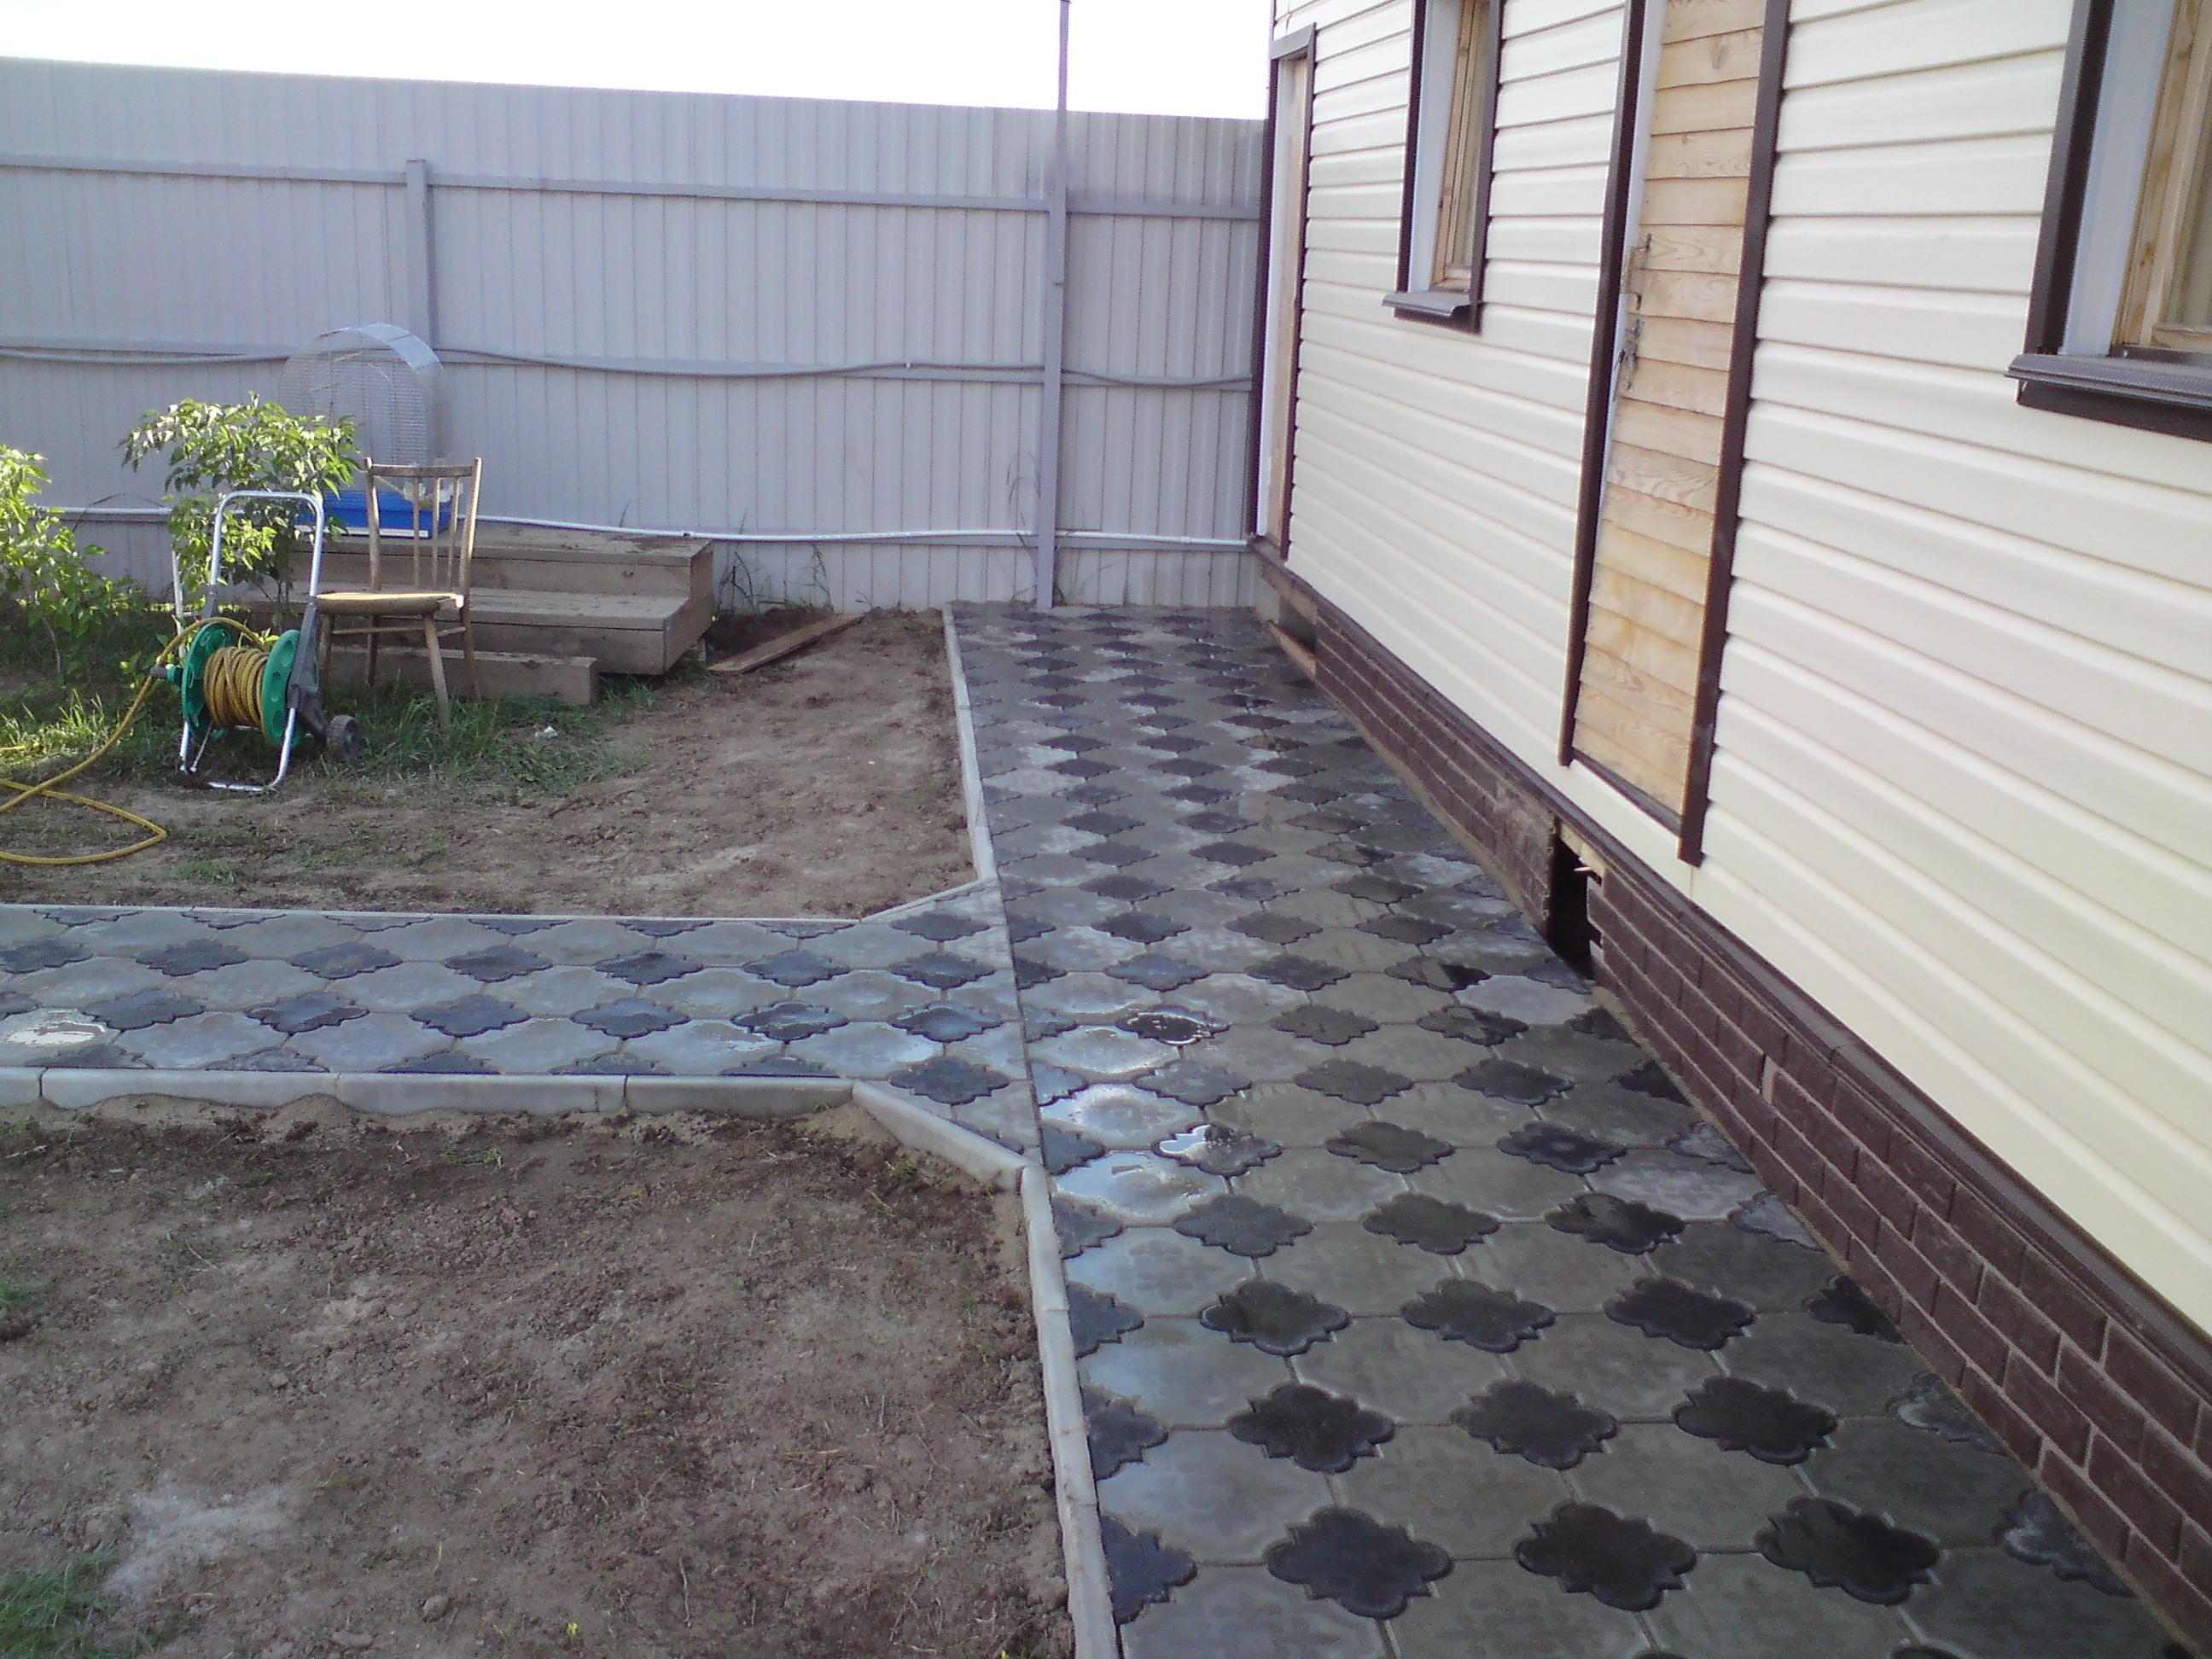 Тротуарная плитка укладка своими руками на даче под навесом